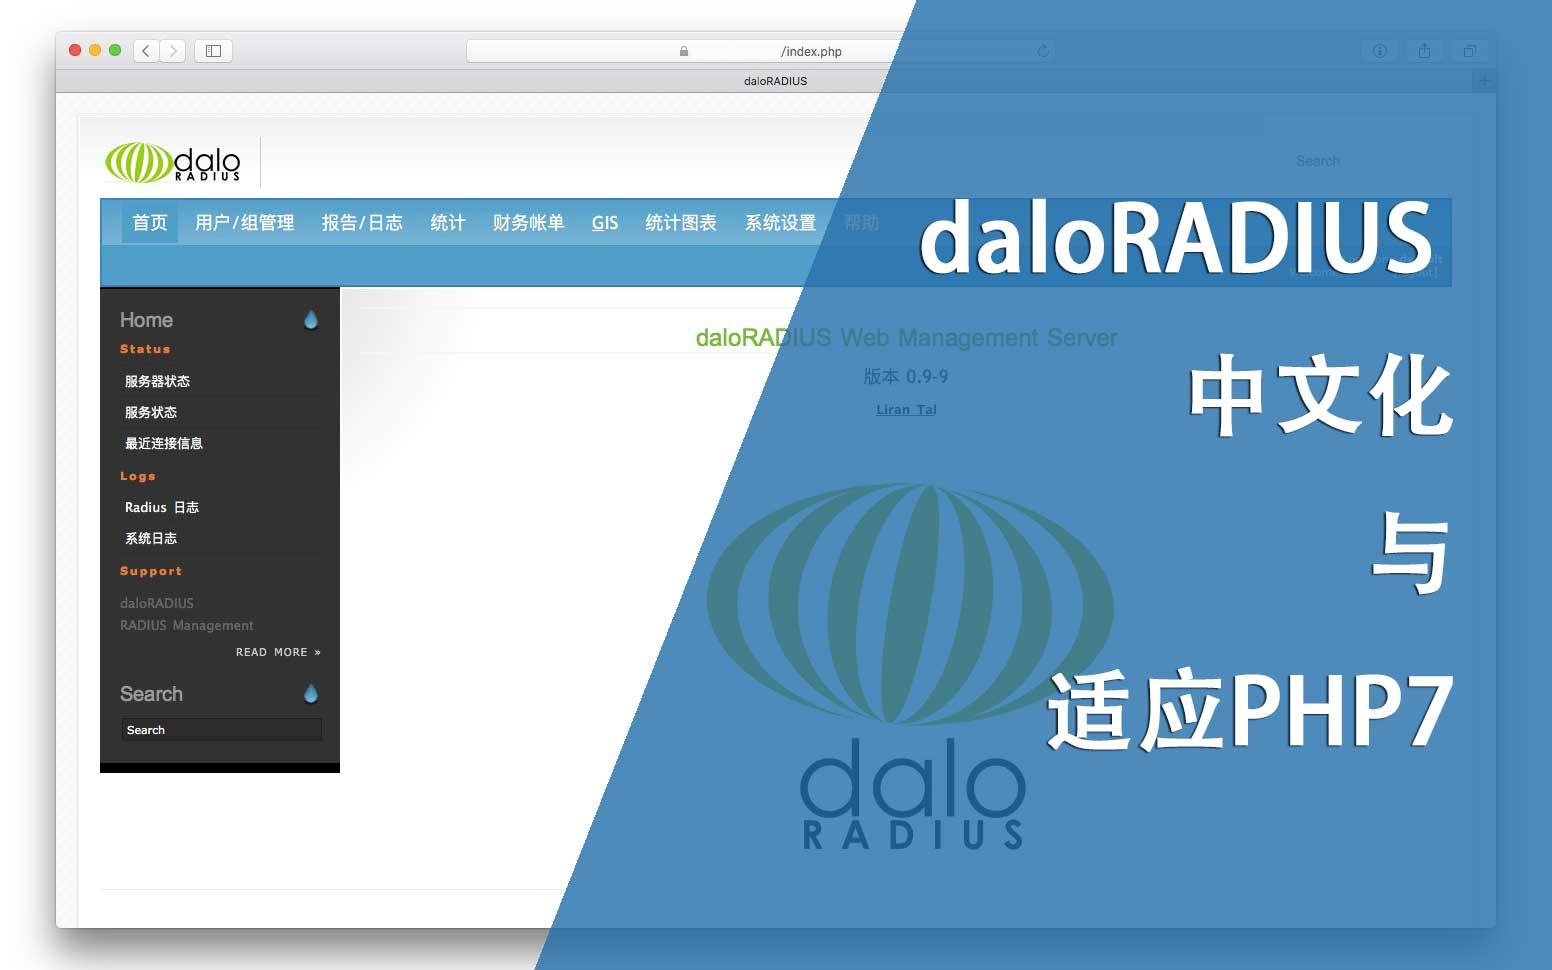 daloRADIUS 中文化与适应PHP7 | NGX Project | NGX HK